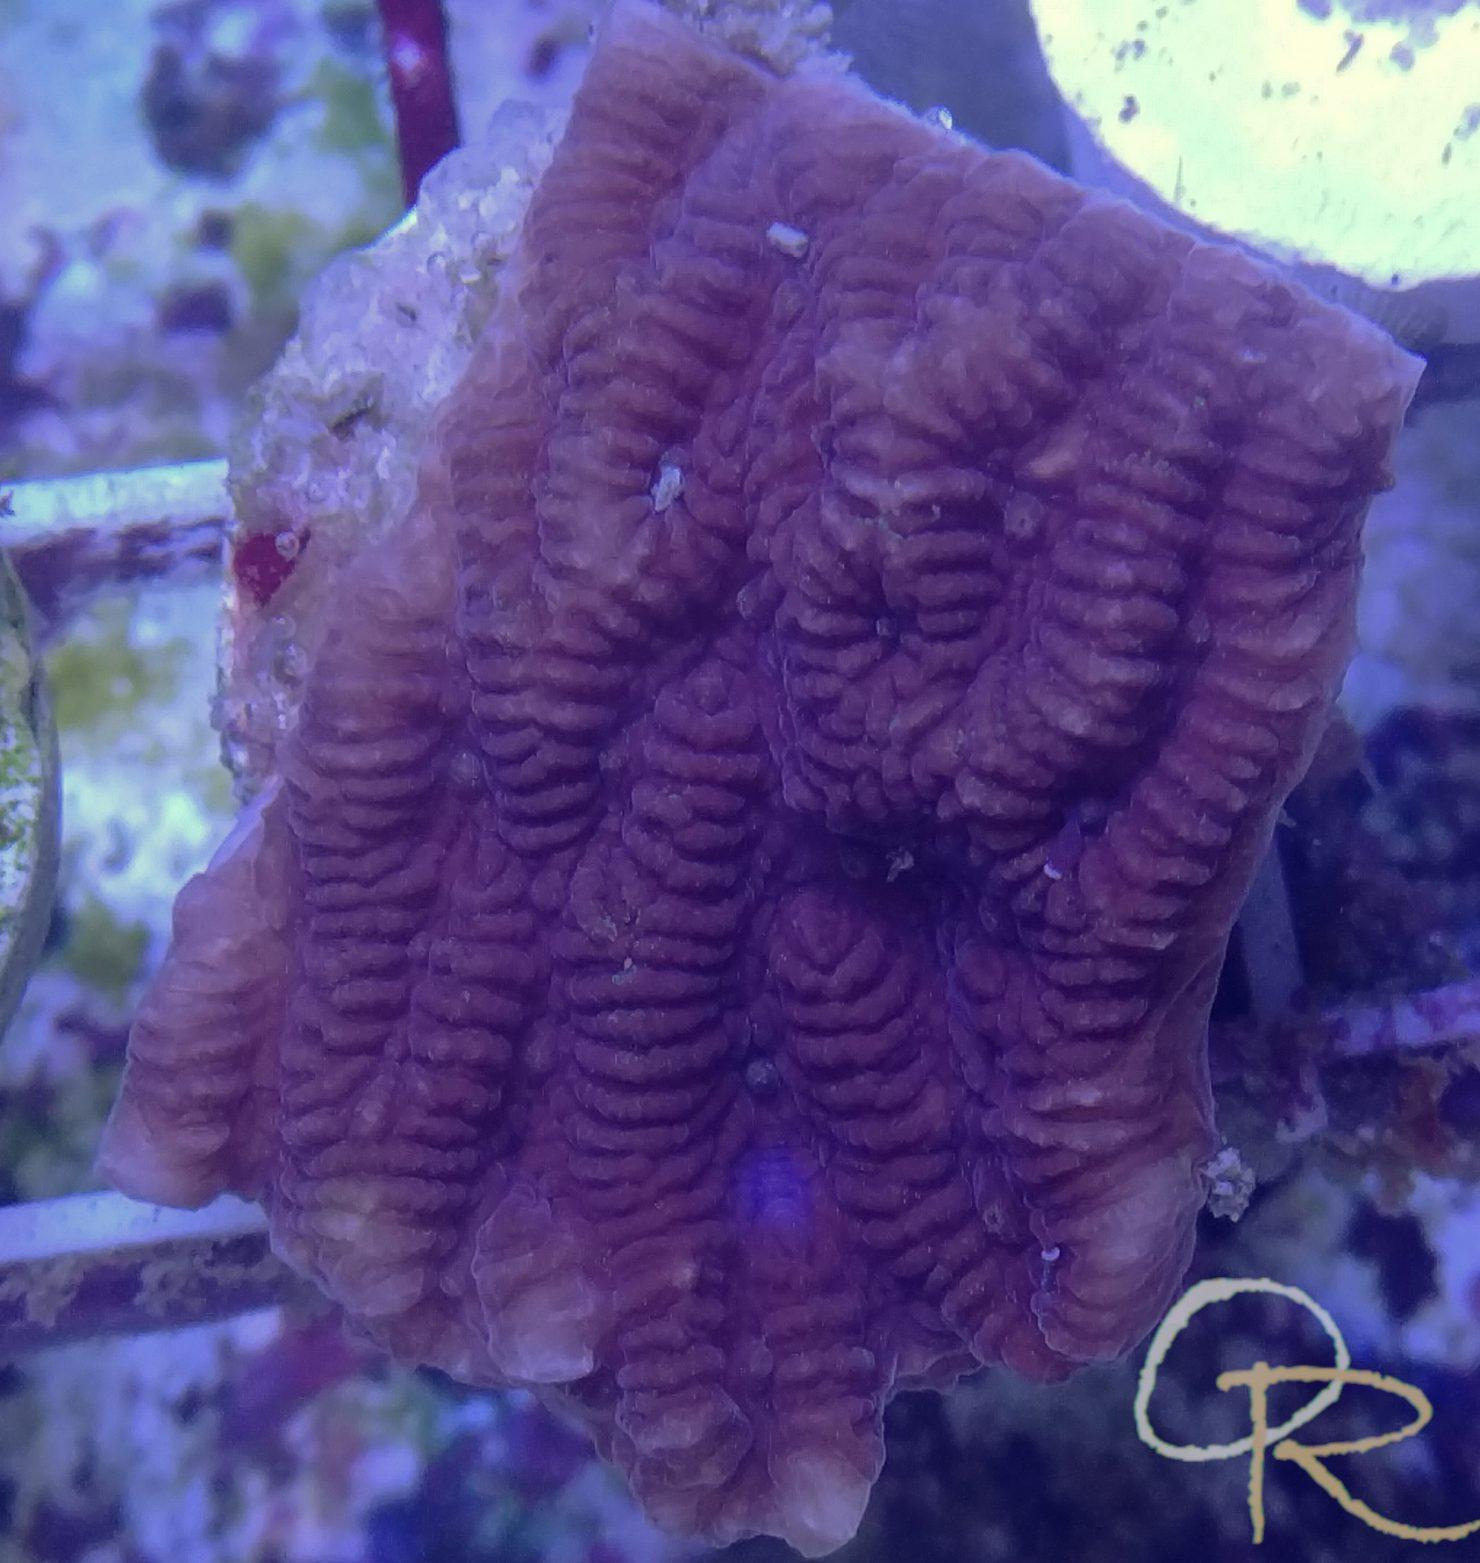 Ruffled Coral (Merulina sp.) – Purple